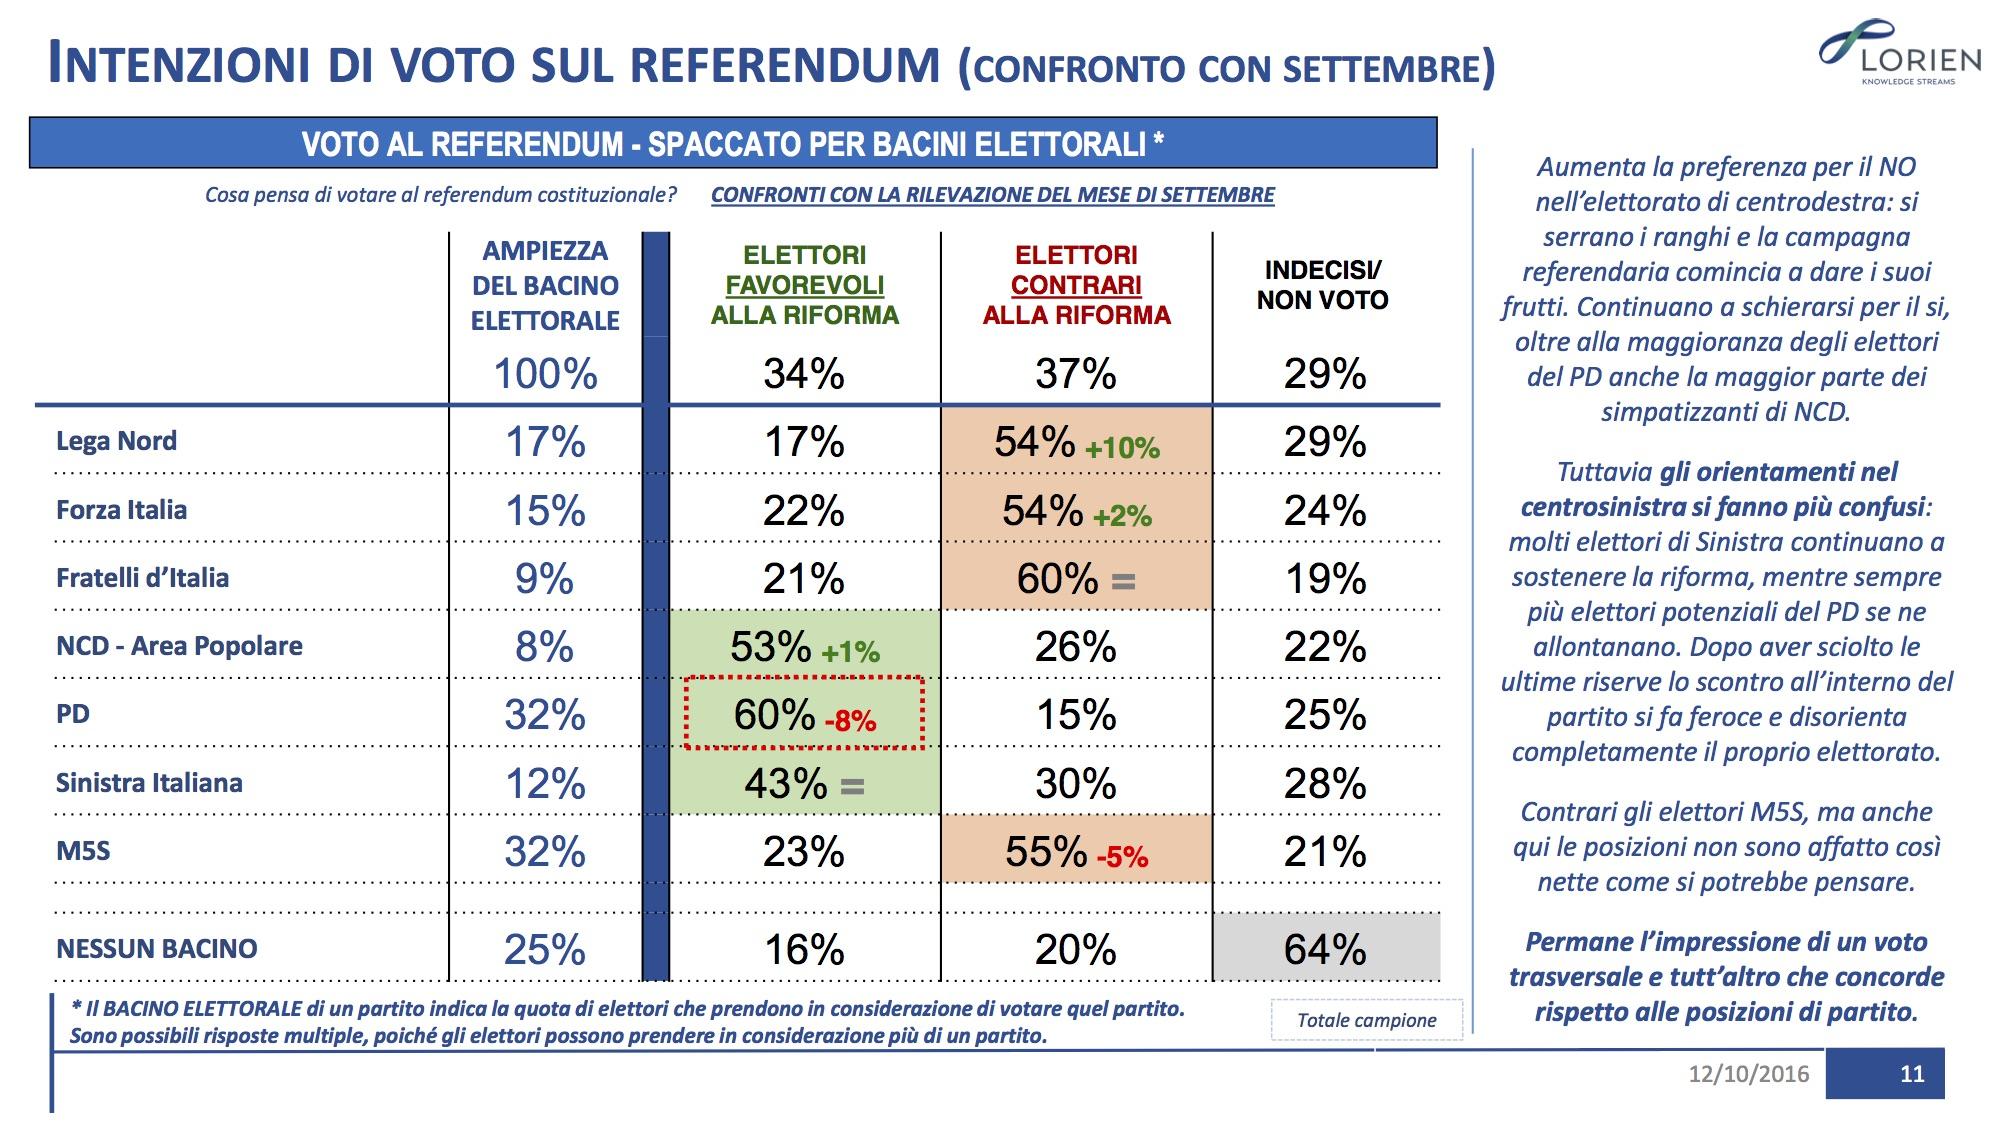 Sondaggio LORIEN 13 ottobre 2016 – Referendum